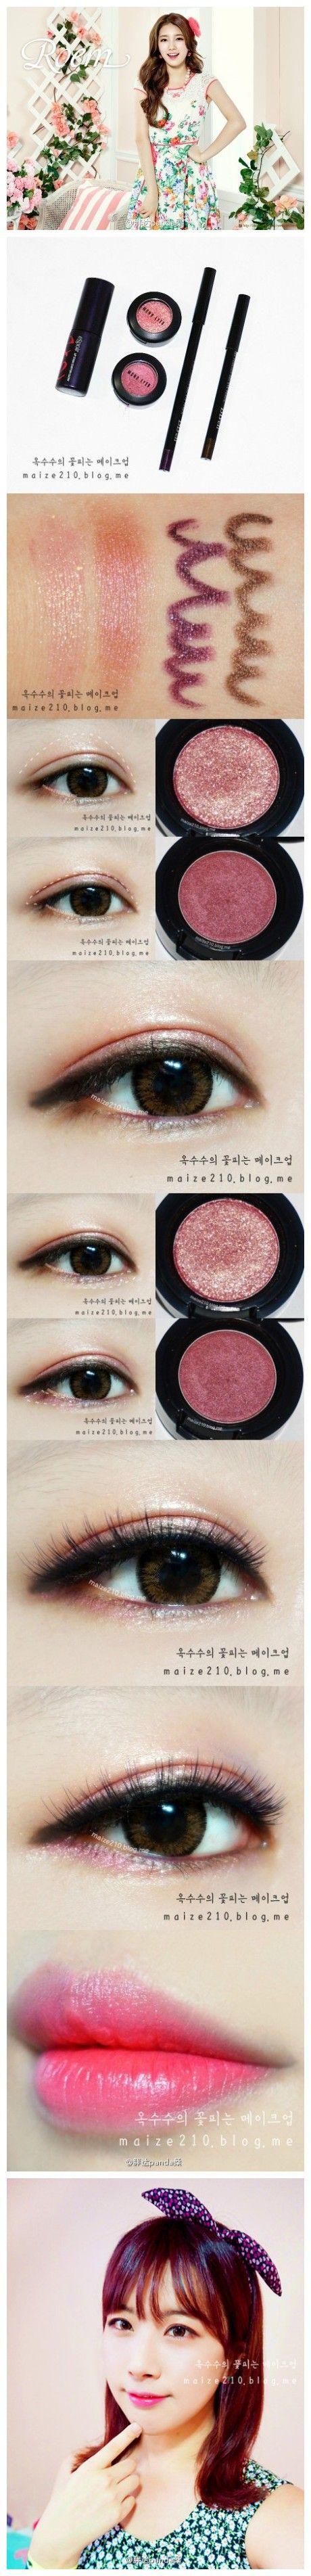 Korean make up  ⭐️⭐️   #JoinNerium #DebbieKrug #NeriumKorea www.AsianSkincare.Rocks